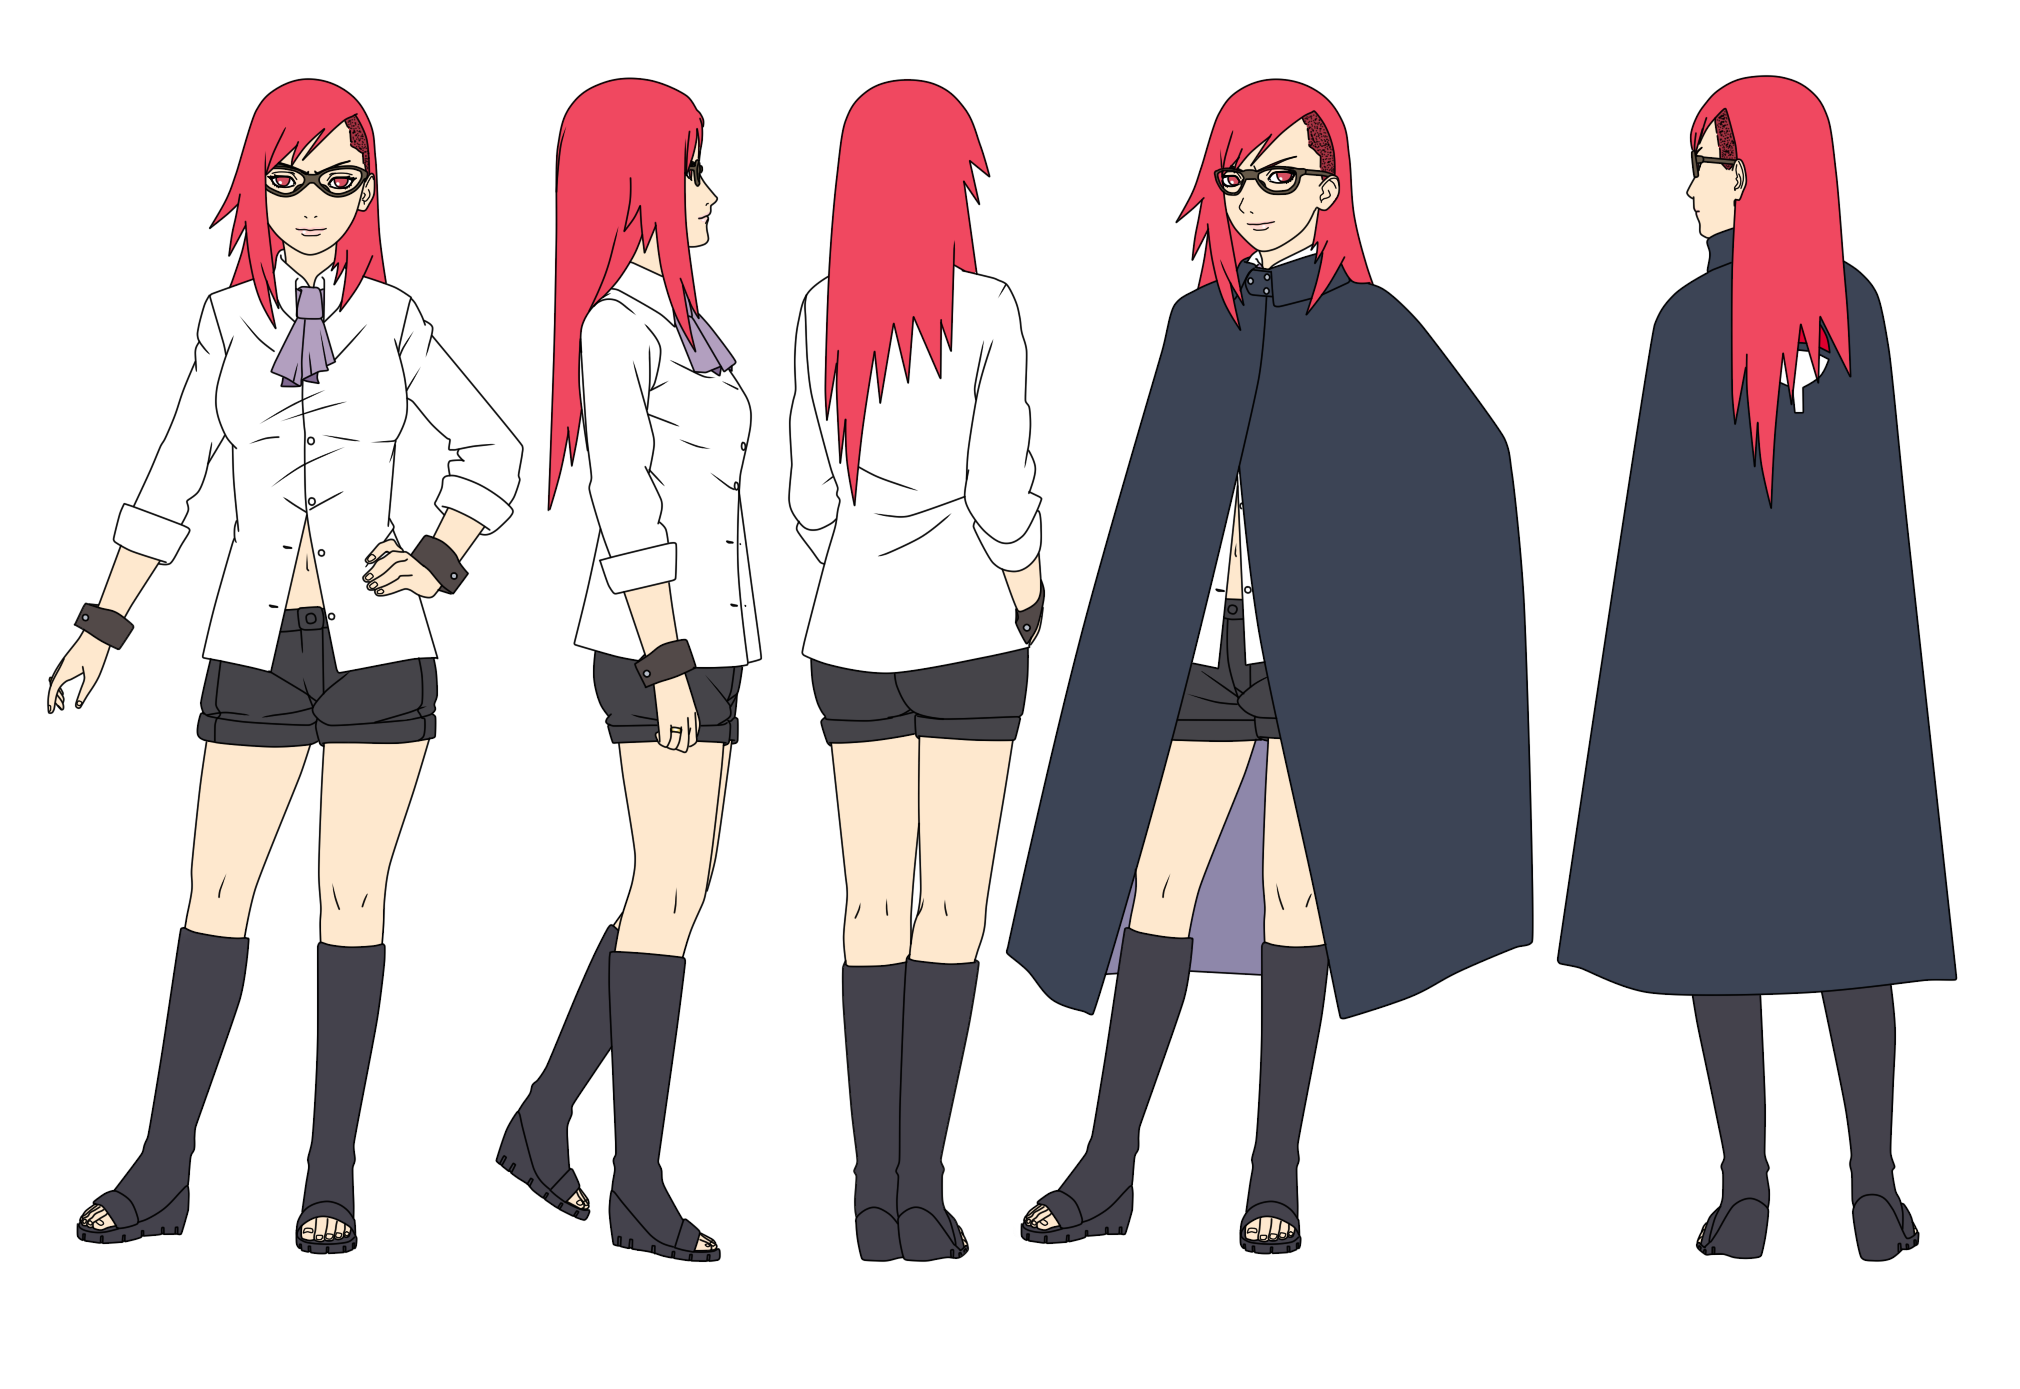 32 best naruto - next generation images on Pinterest | Anime ...